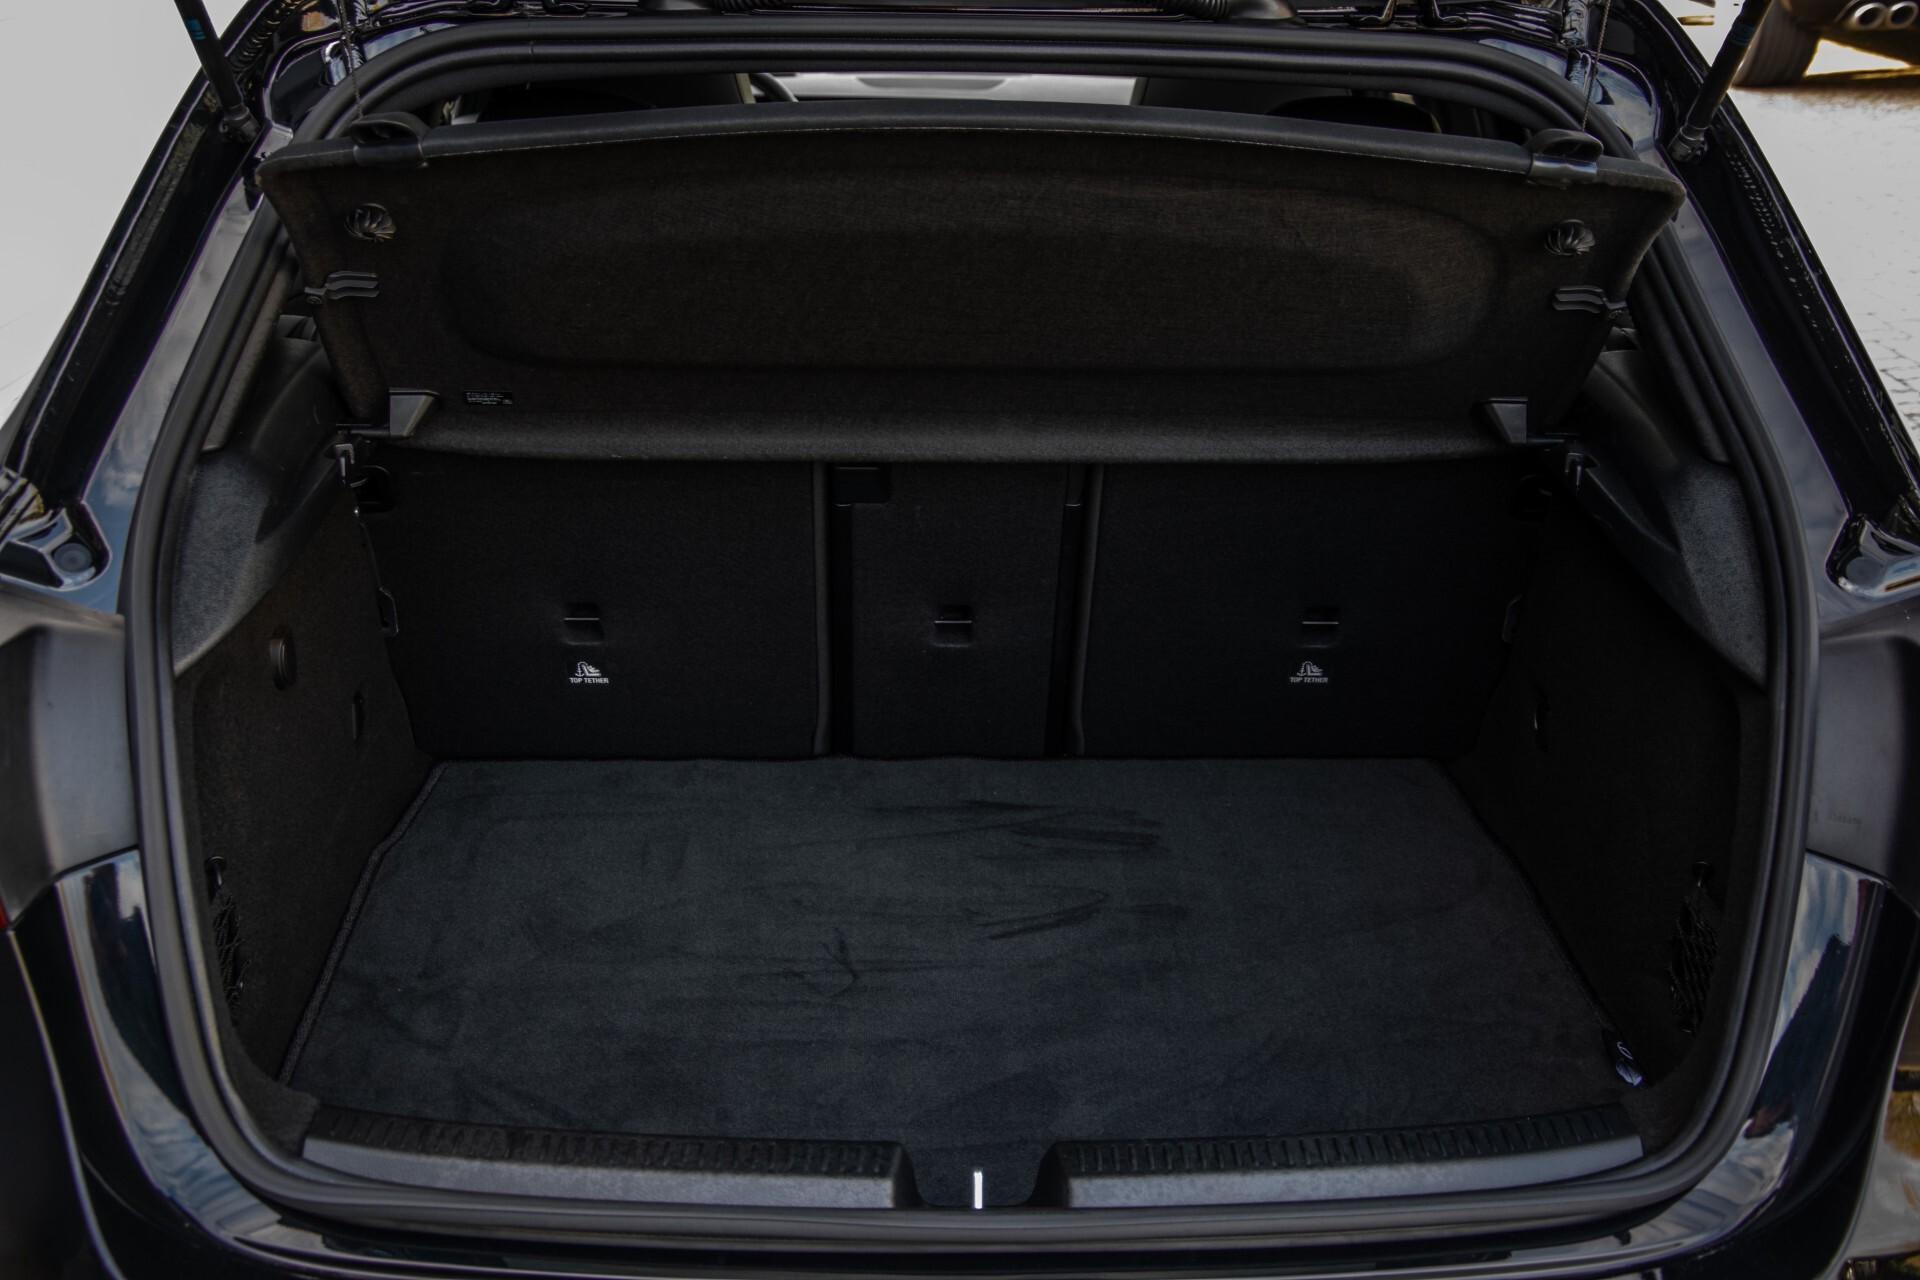 Mercedes-Benz A-Klasse 250 4-M AMG Panorama/Keyless-Entry/MBUX/HUD/Burmester/360/Multibeam LED Aut7 Foto 51